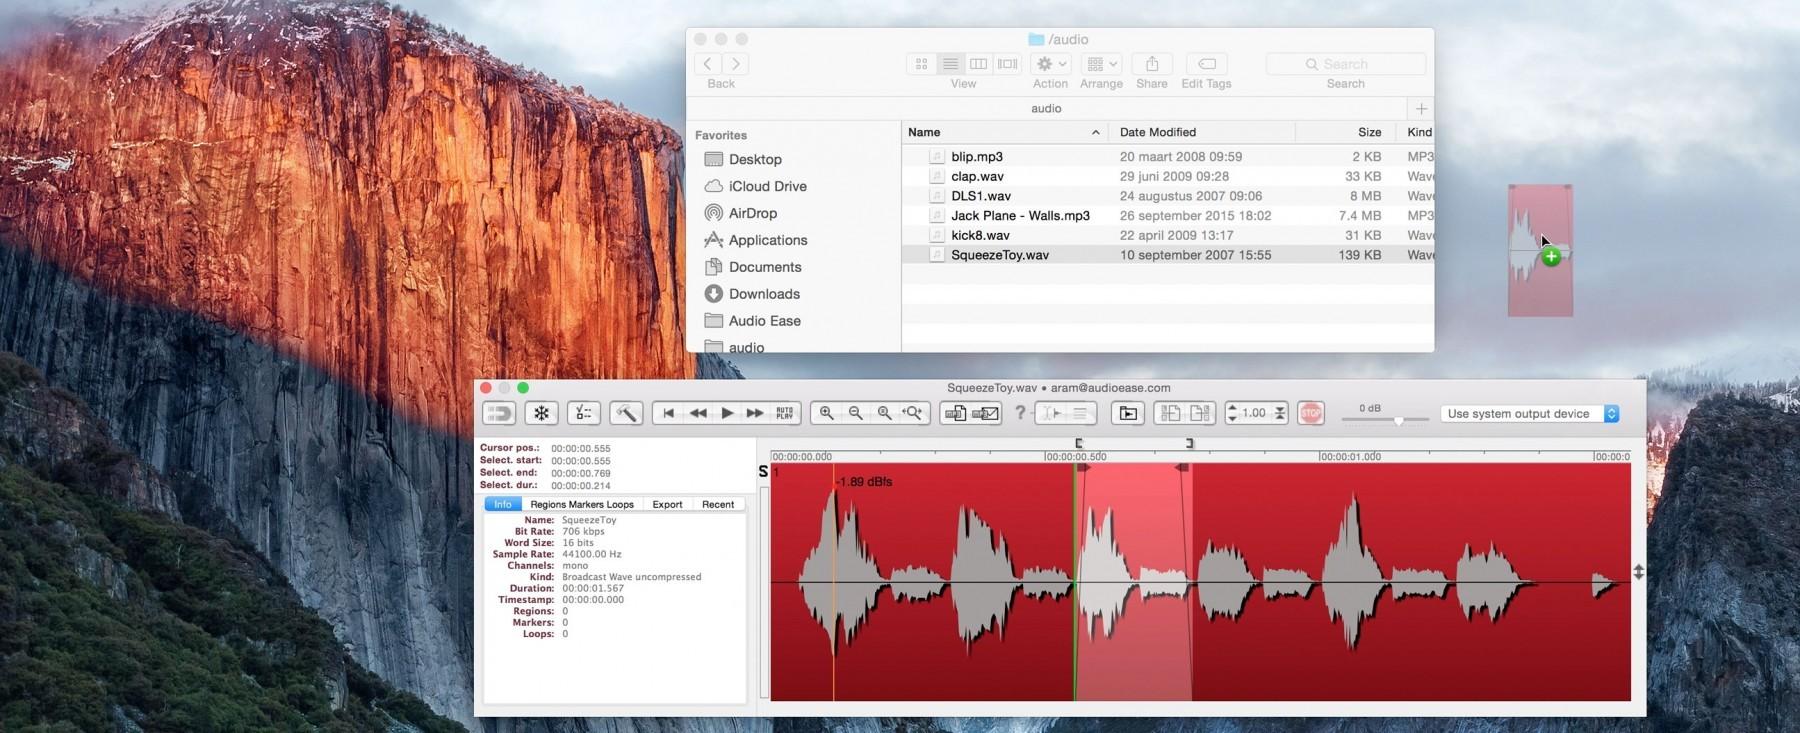 Audio Ease 音频助理软件 Snapper 2 演示